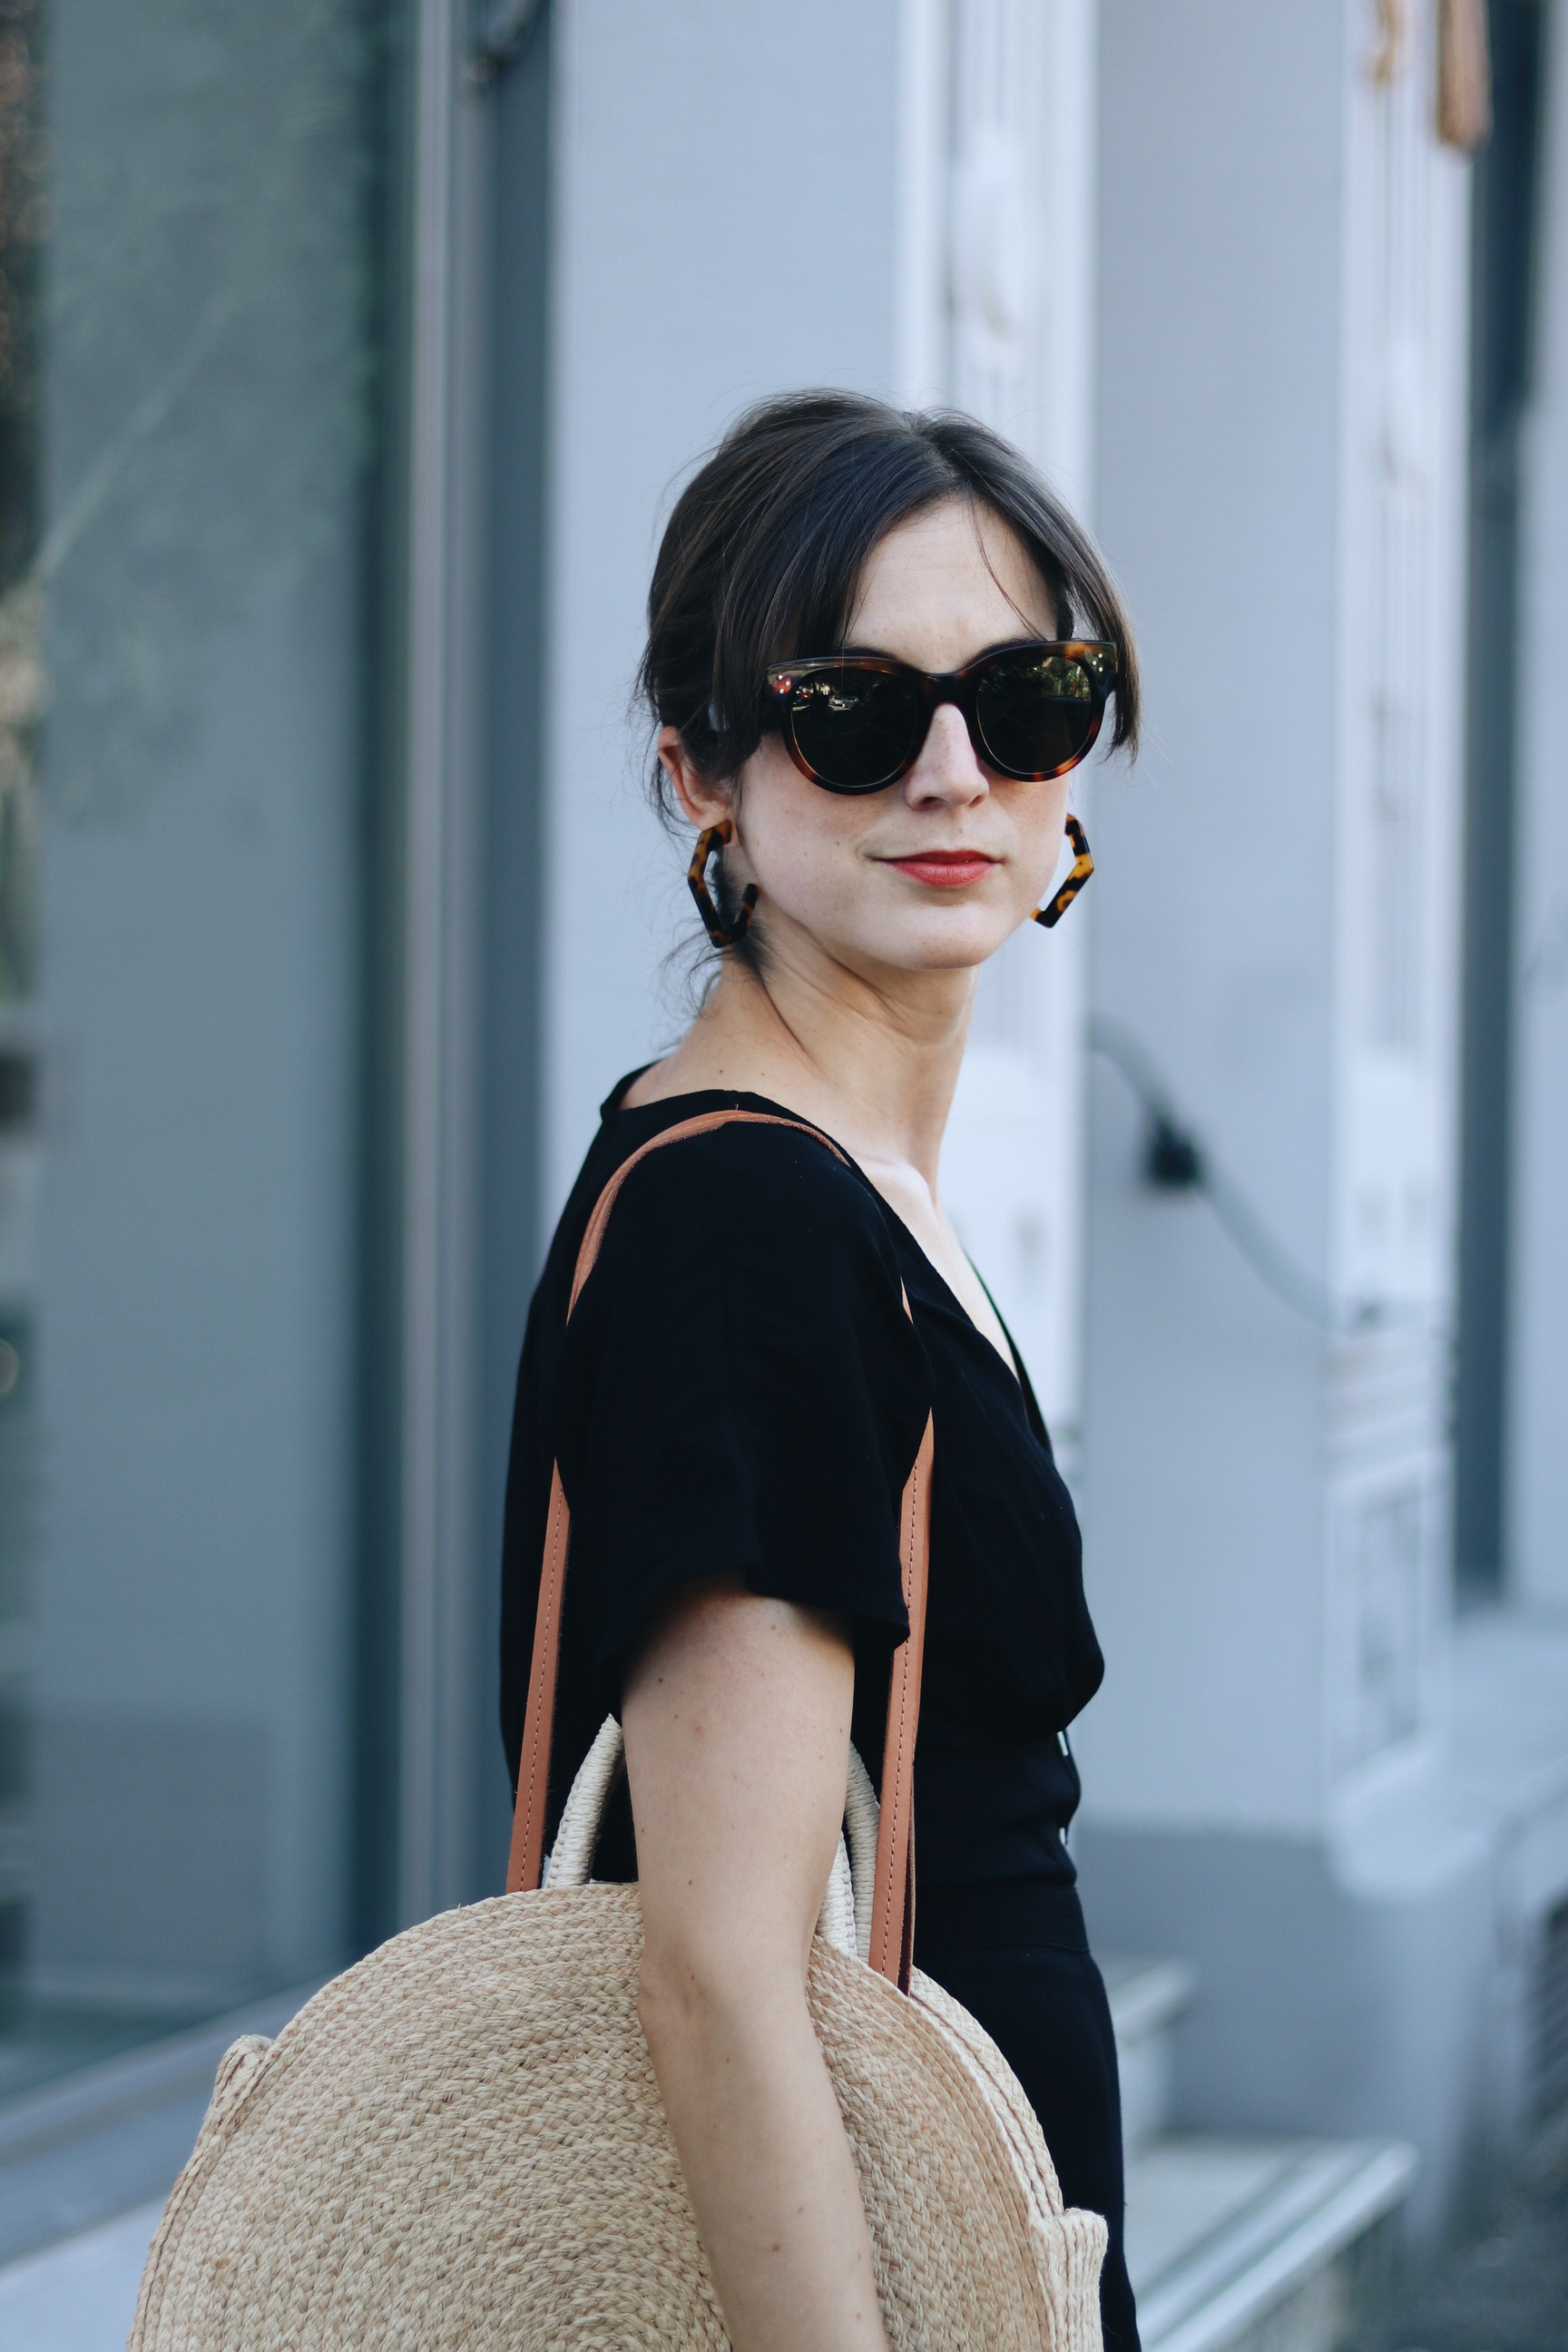 Jumpsuit Outfit Sommer Blog Fashionblog Modebloggerin Neele Korbtasche rund